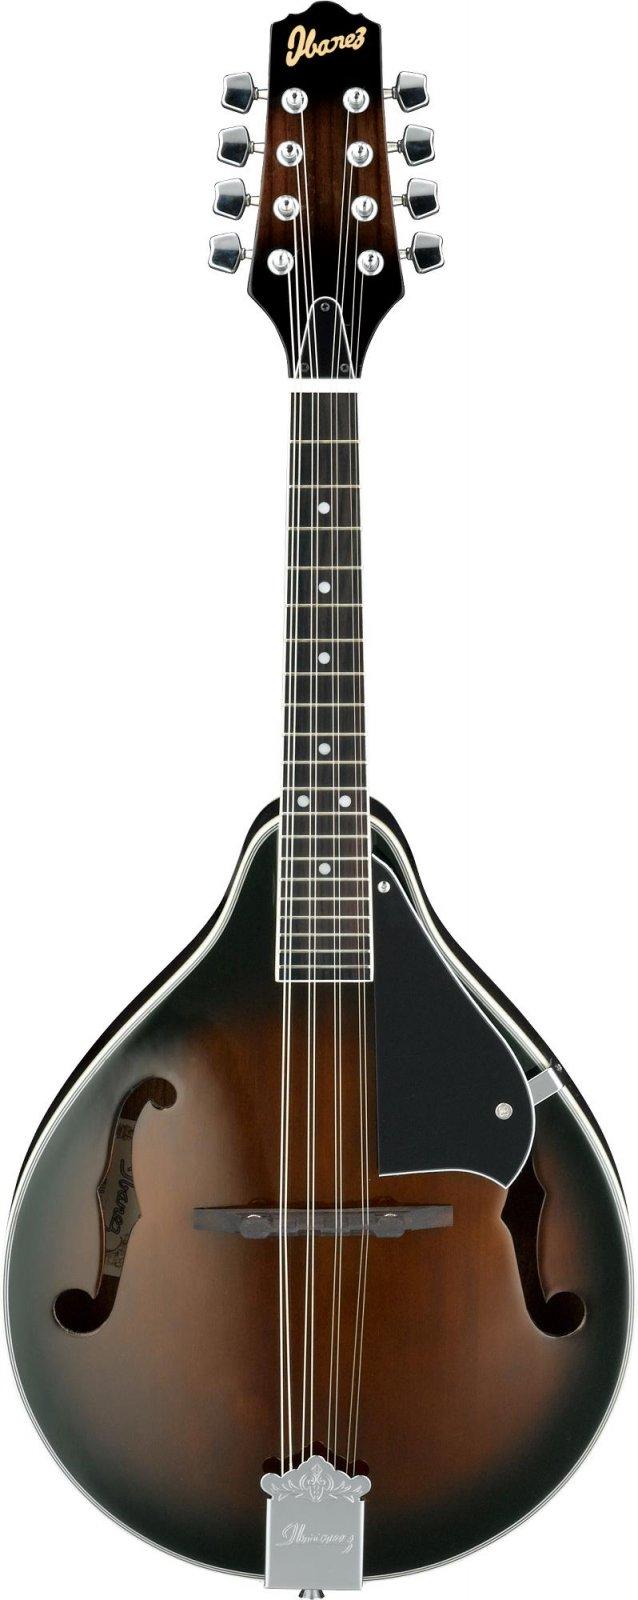 Ibanez M510DVS A-Style Mandolin - Dark Violin Sunburst